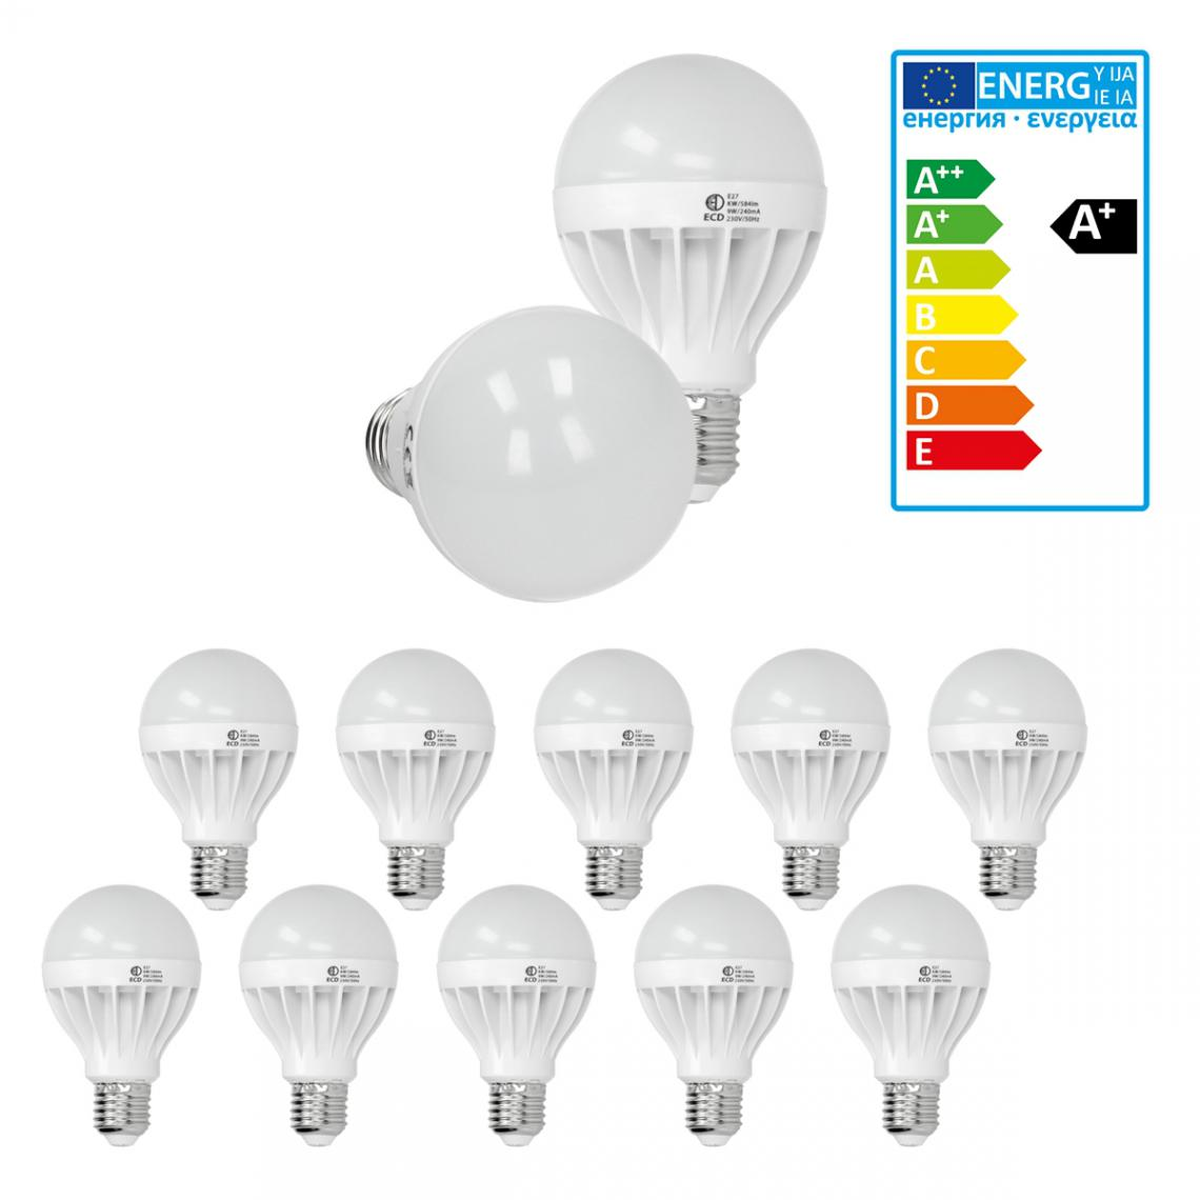 Ecd Germany ECD Germany 10 x 9W E27 LED Lampe   6000 Kelvin blanc froid   584 lumens   220-240 V   remplace une ampoule halogène de